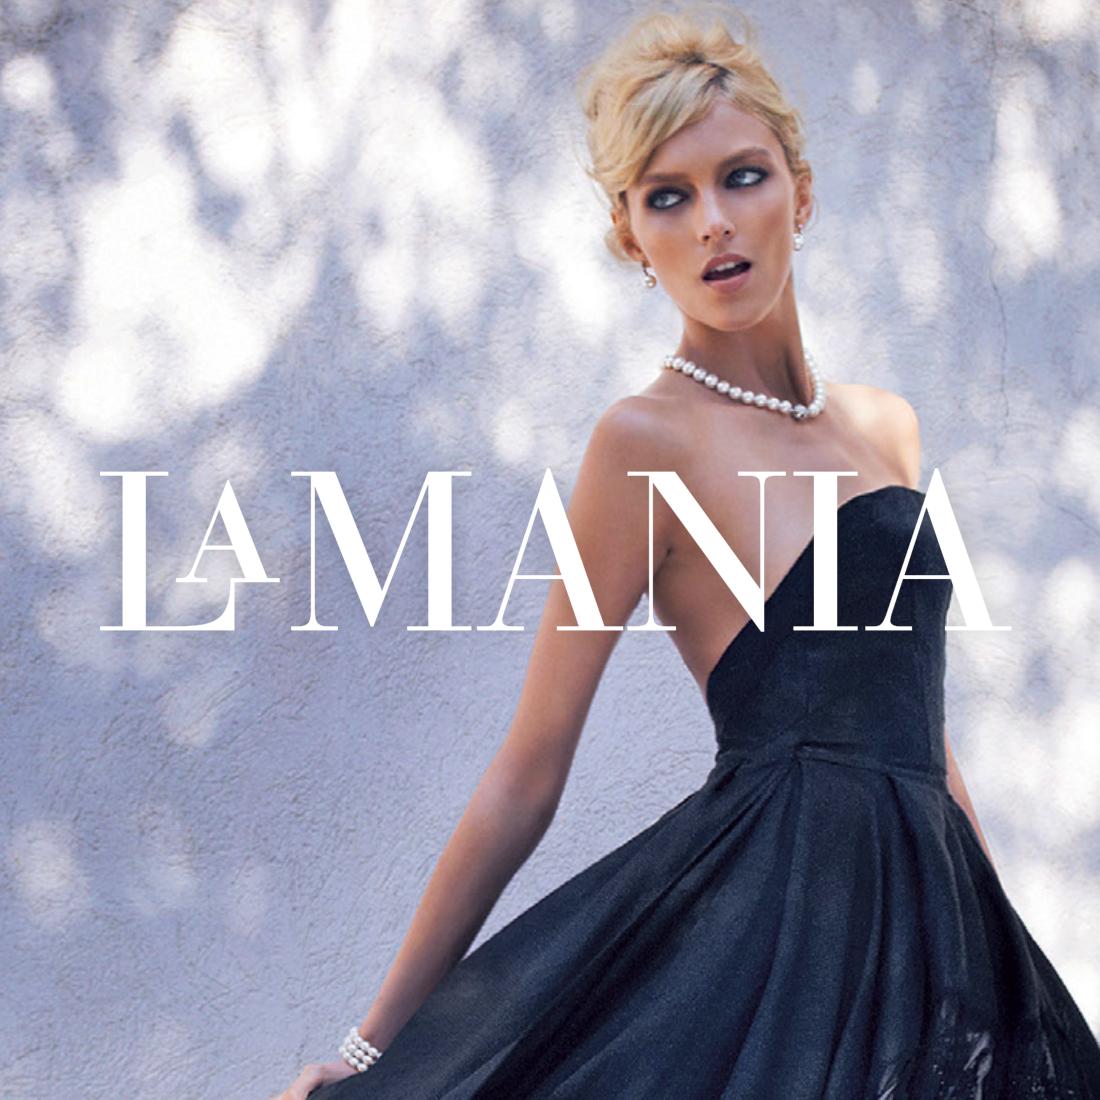 La MANIA - agencja reklamowa opakowania